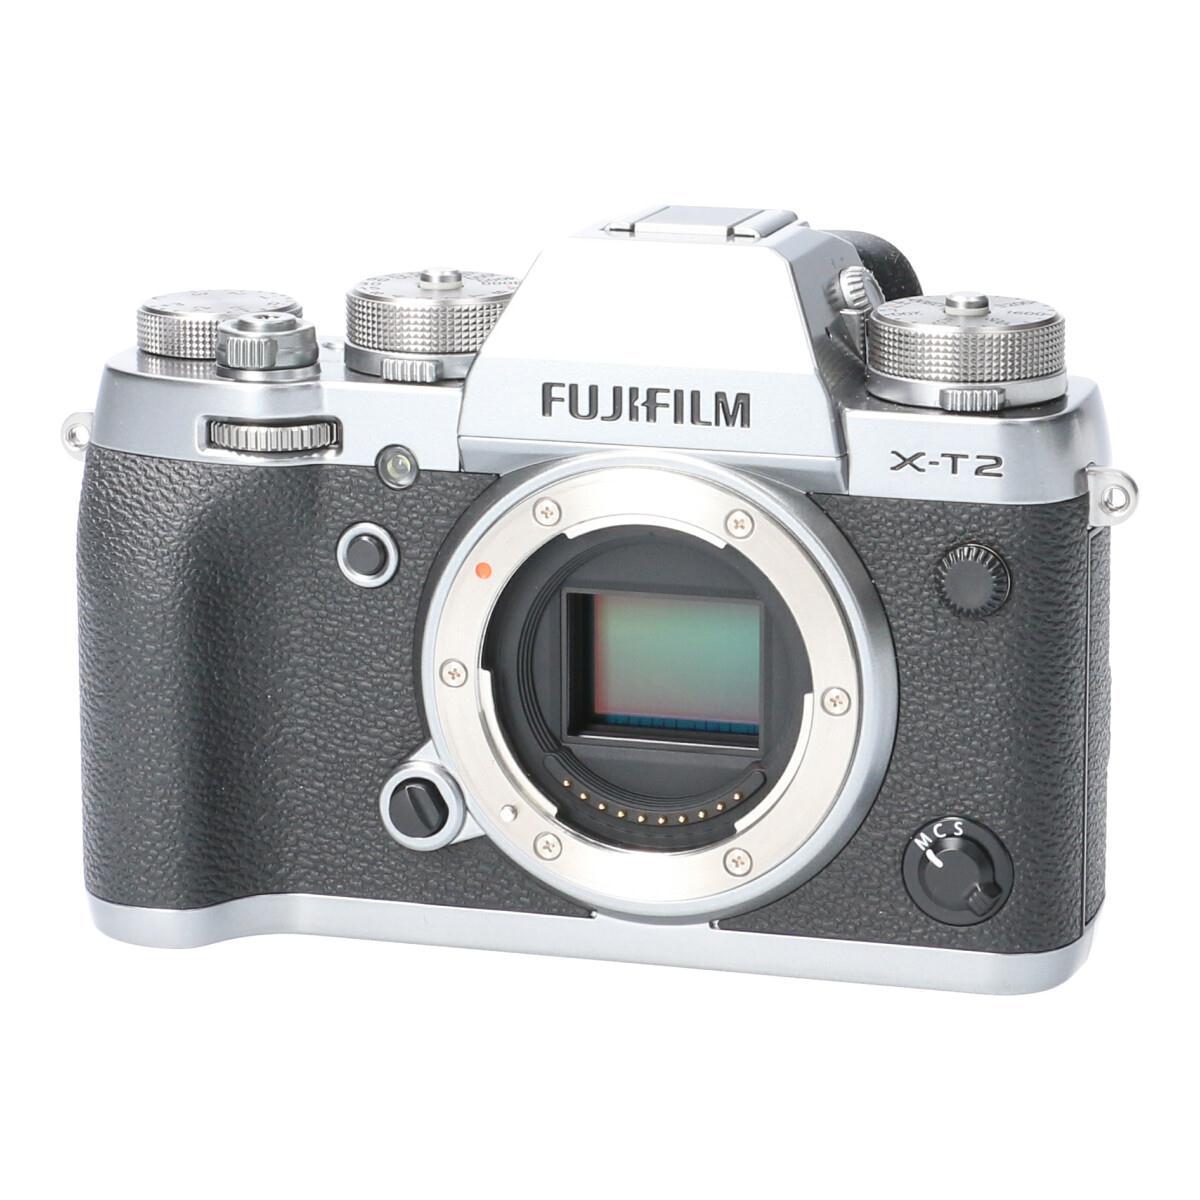 FUJIFILM X-T2グラファイトシルバー【中古】